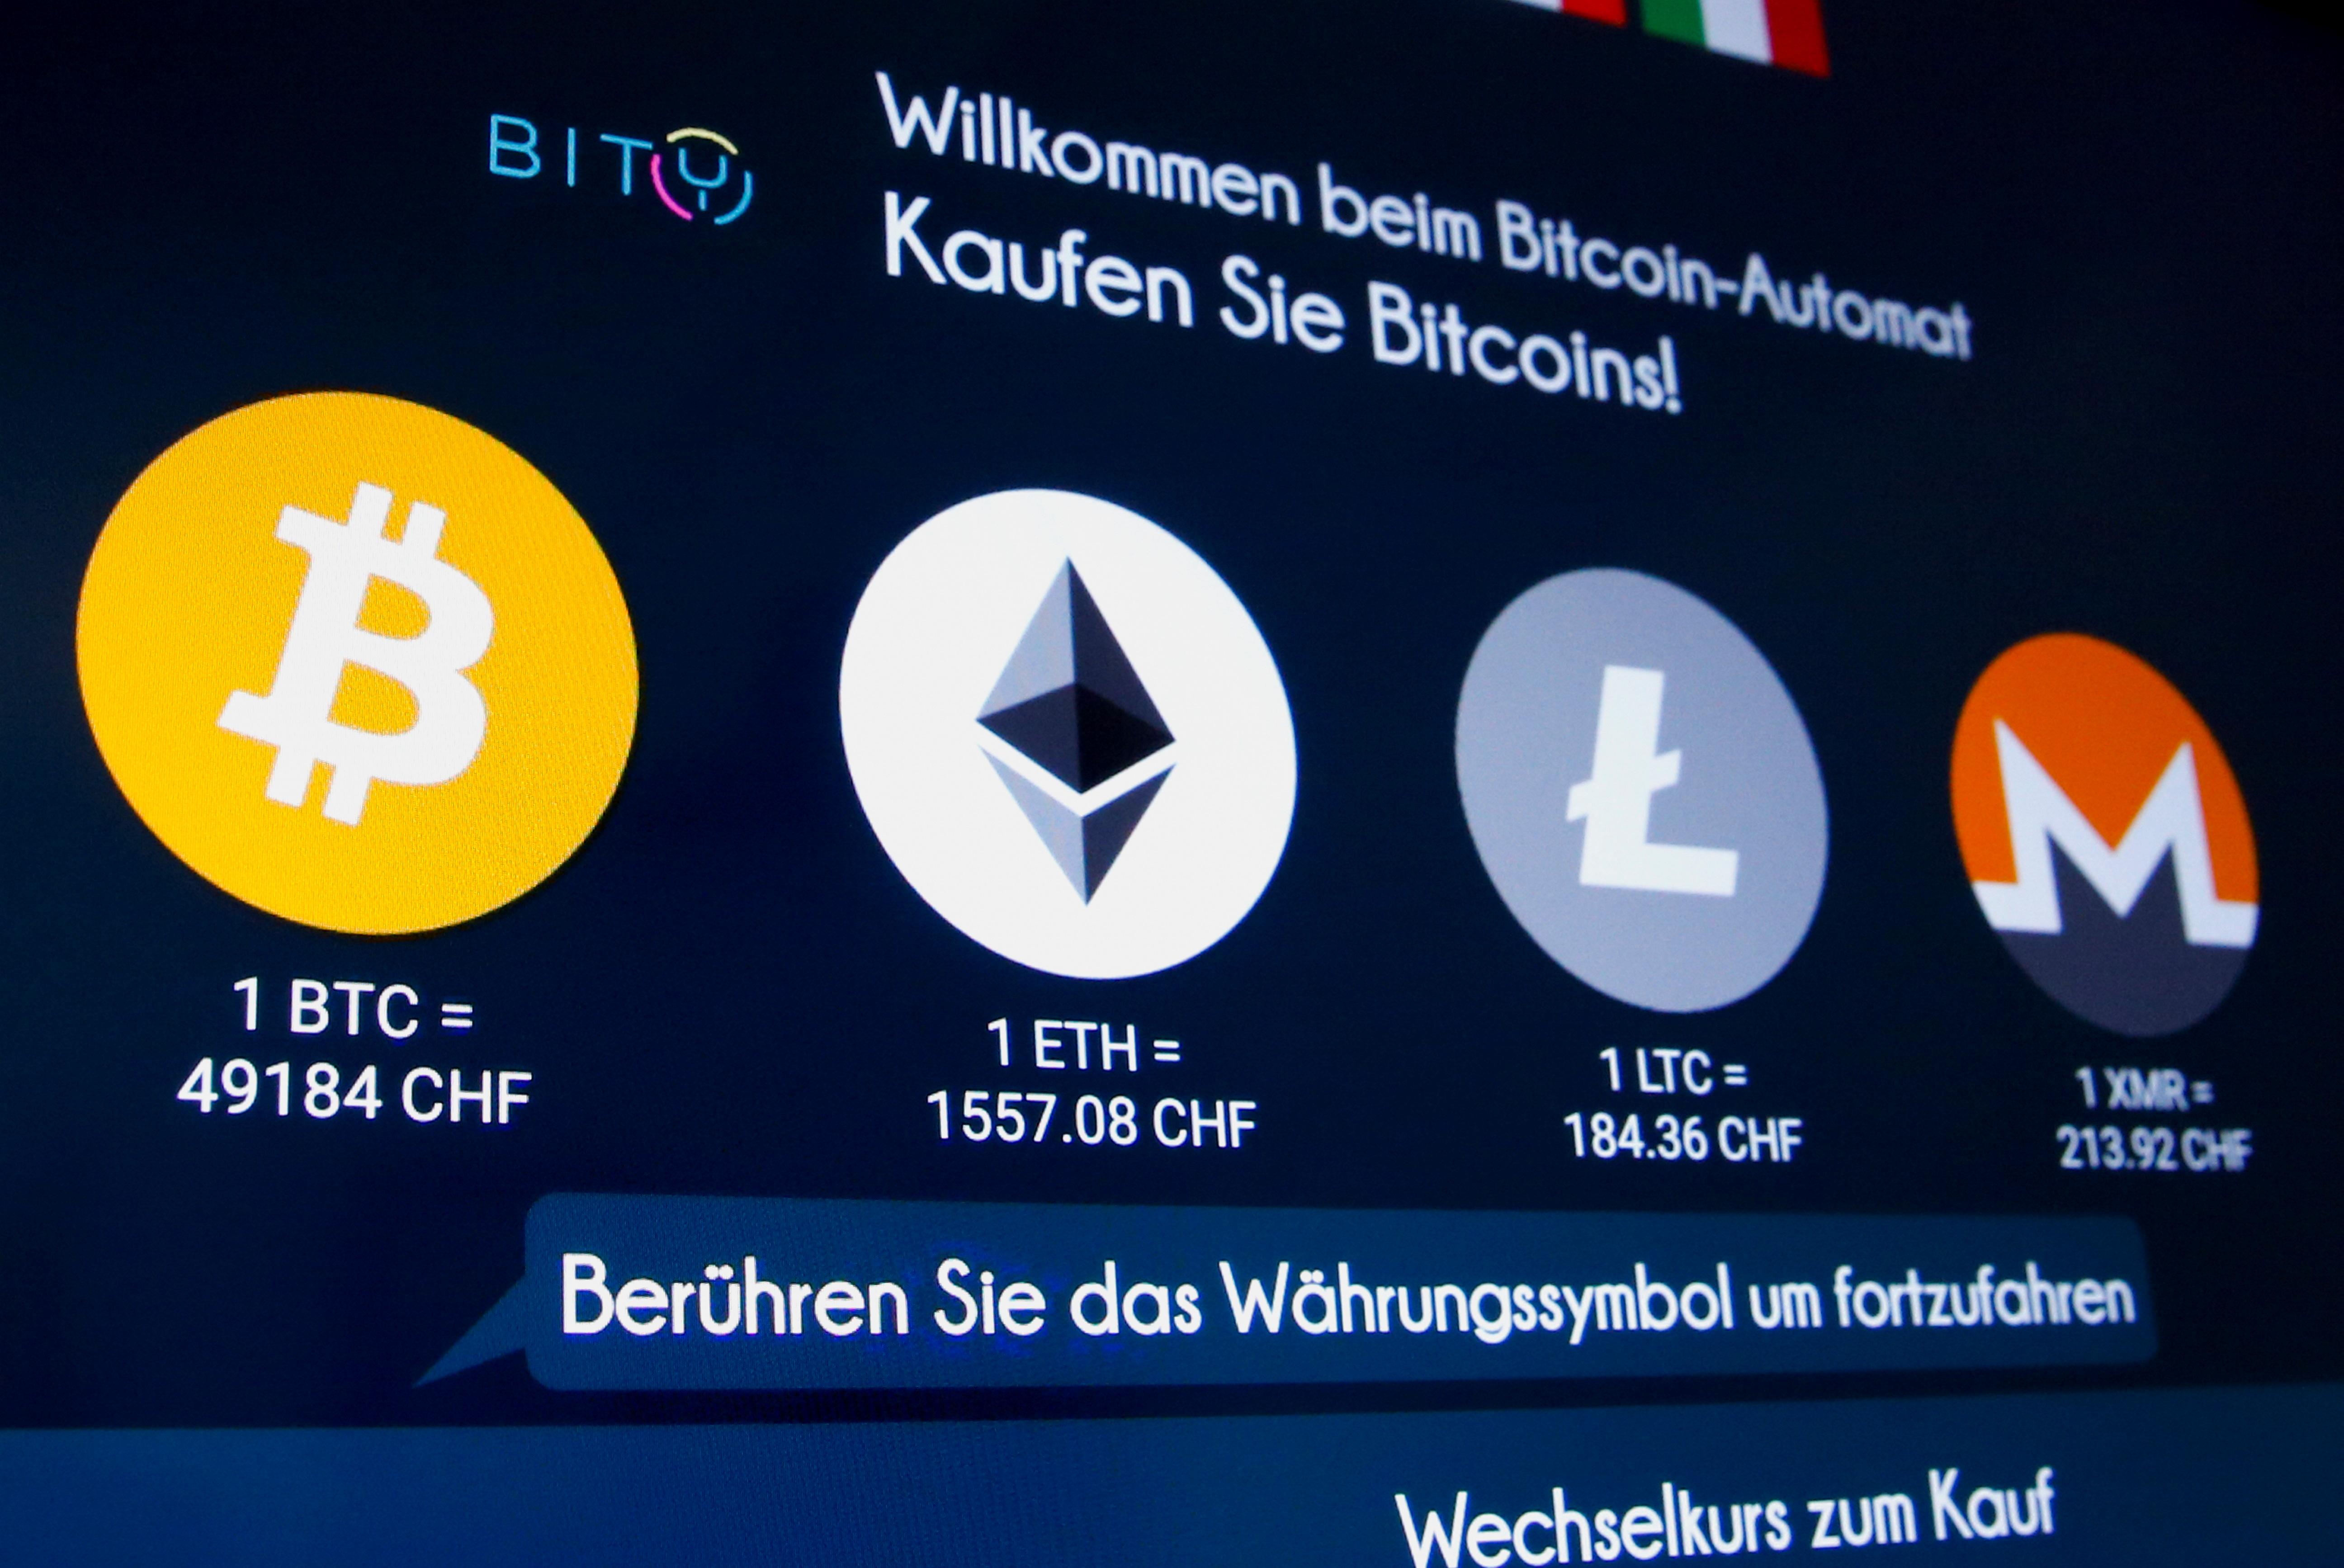 Exchange btc for xmr|bityard.com aave token - Gyakori kérdések